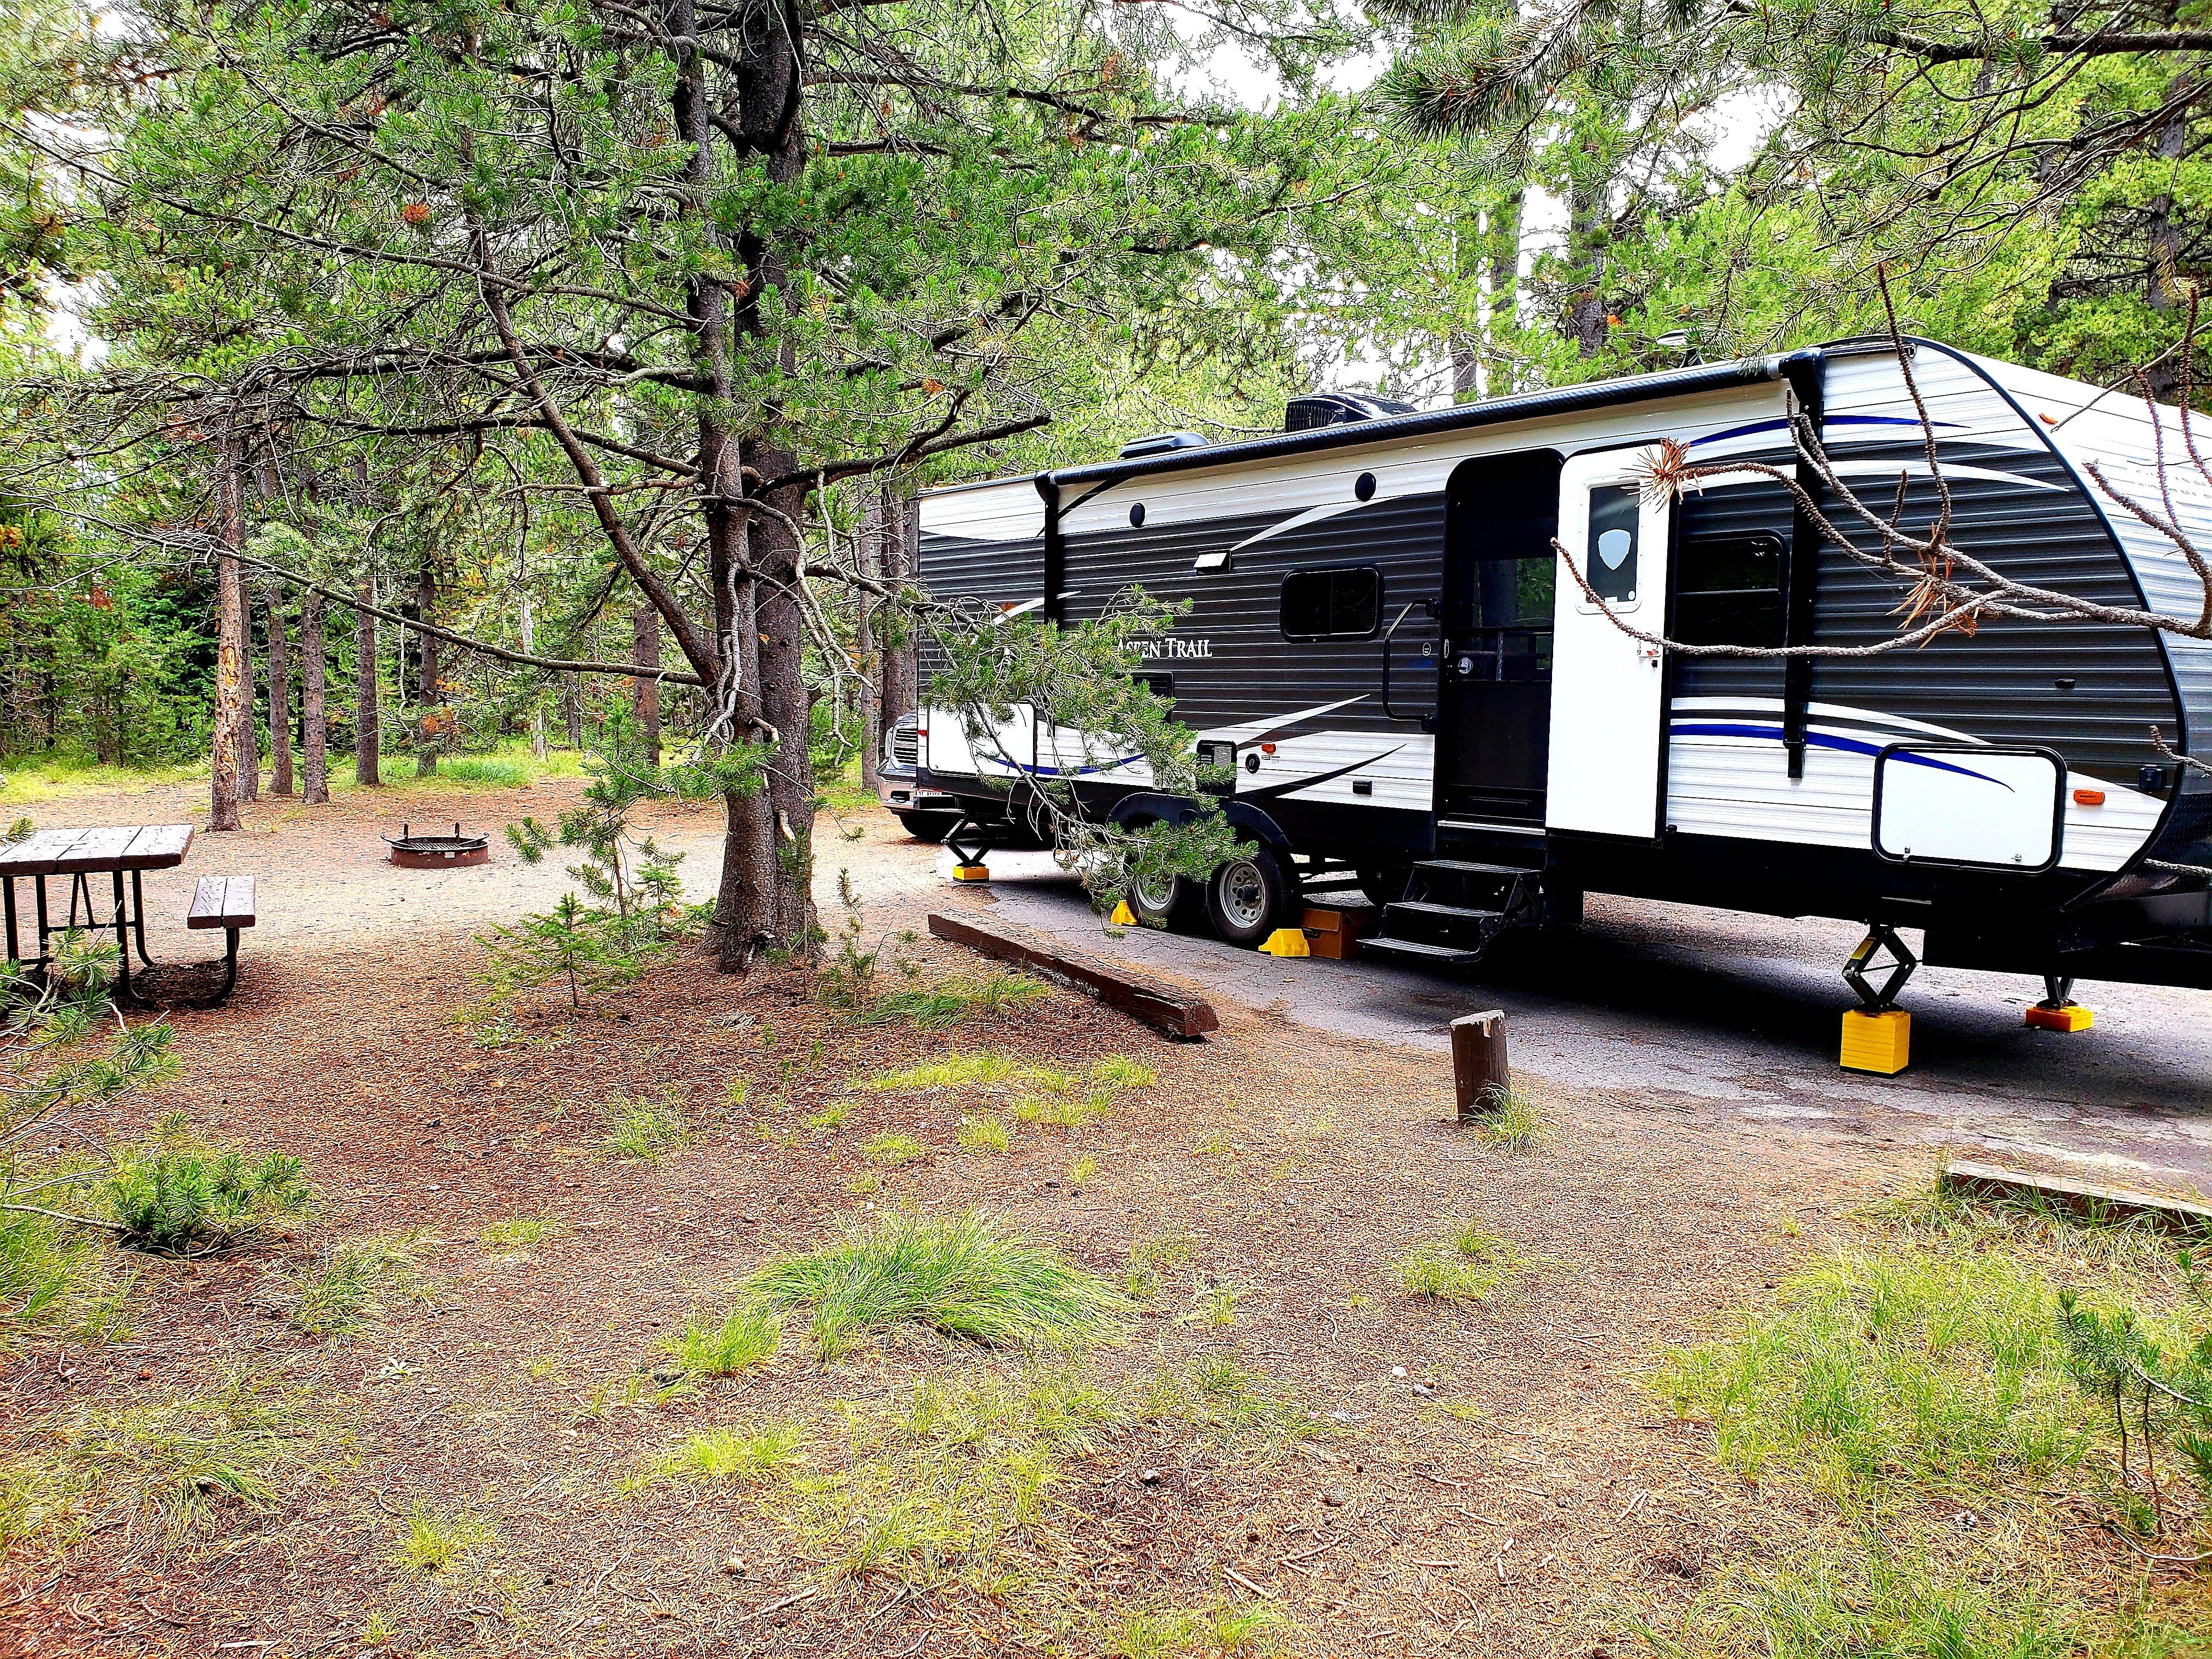 aspen trail 2750bhs 2018